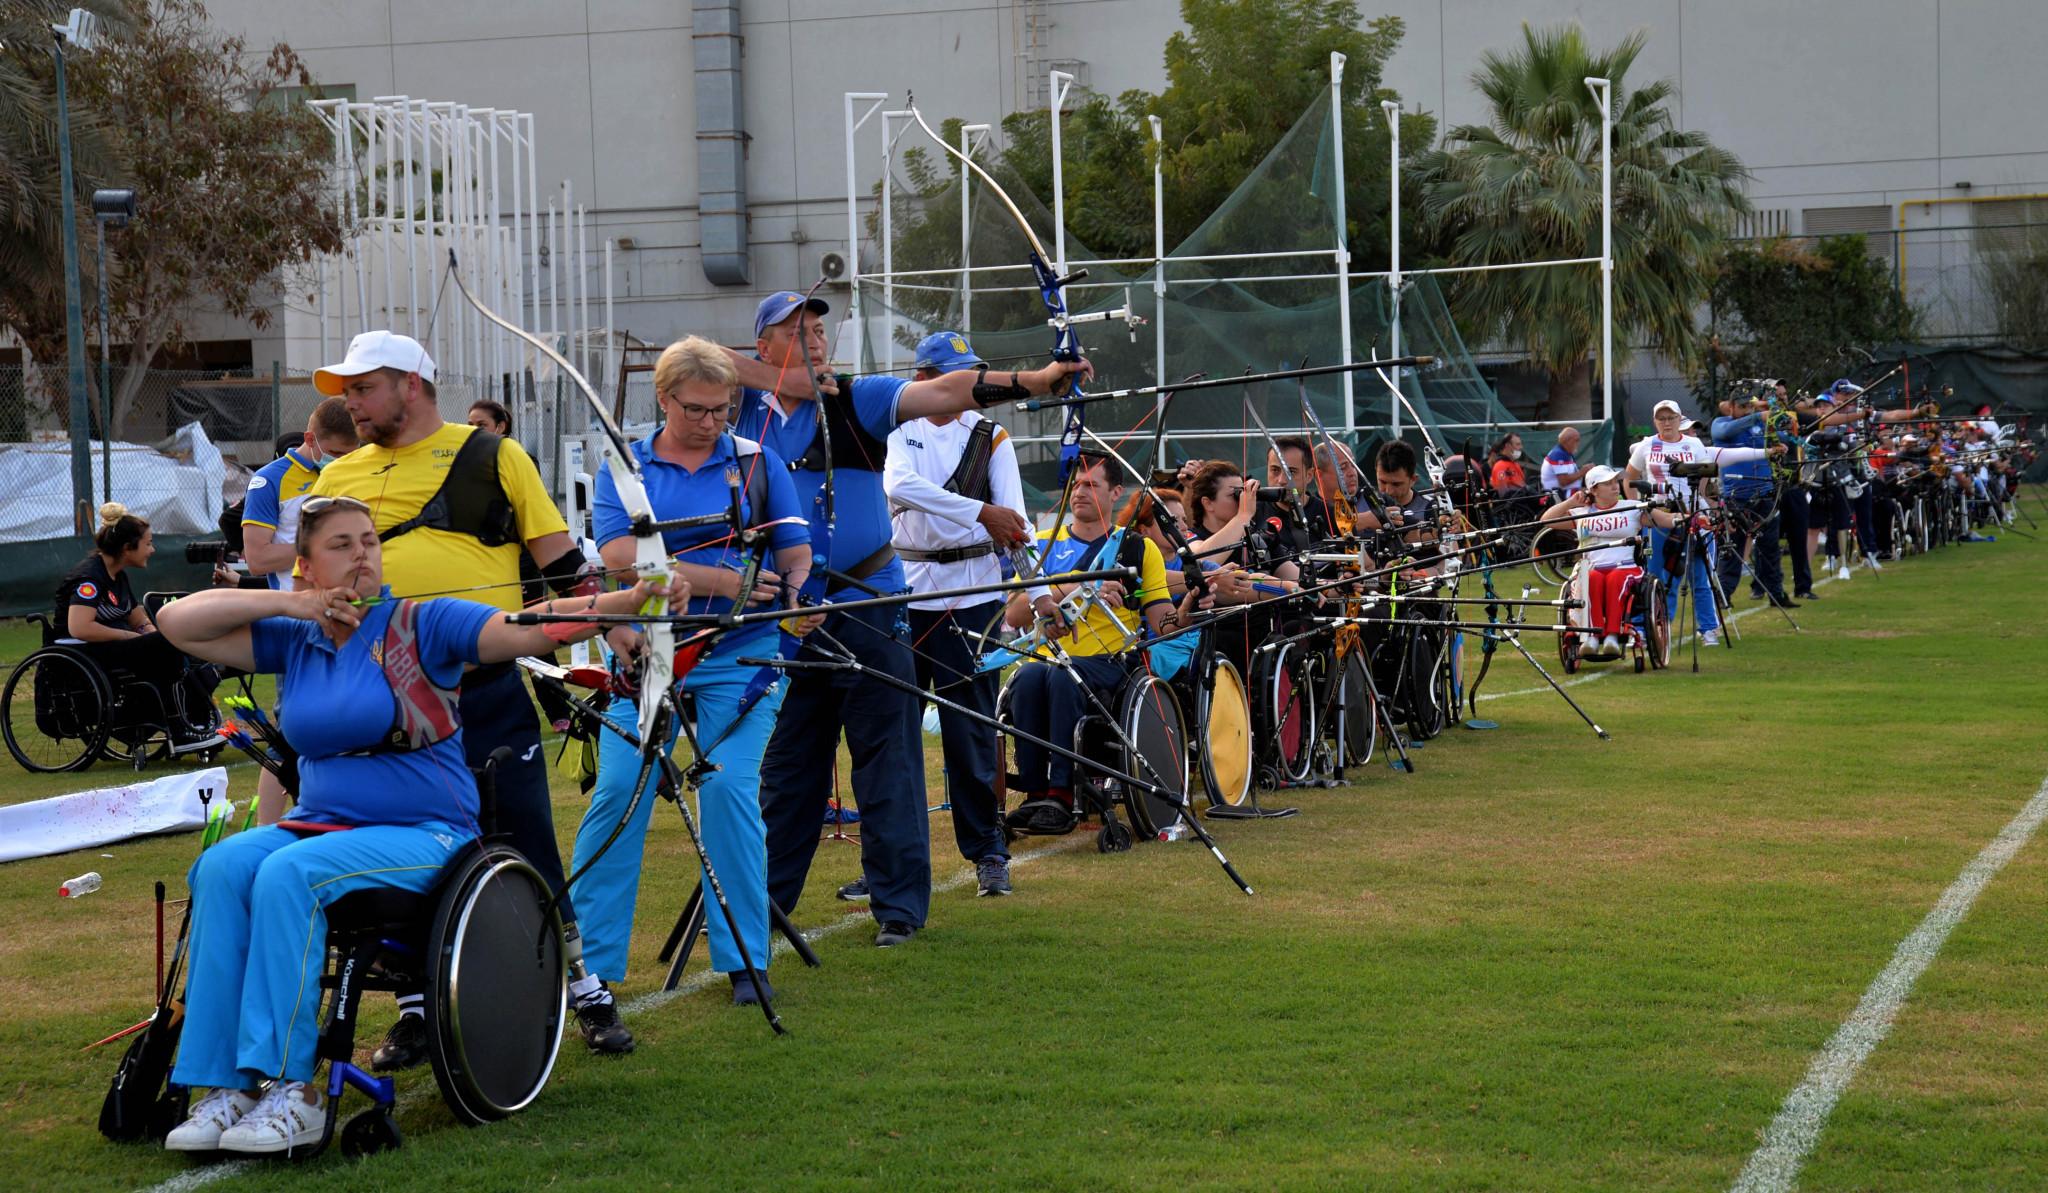 Dubai to stage first international Para-archery event in 12 months